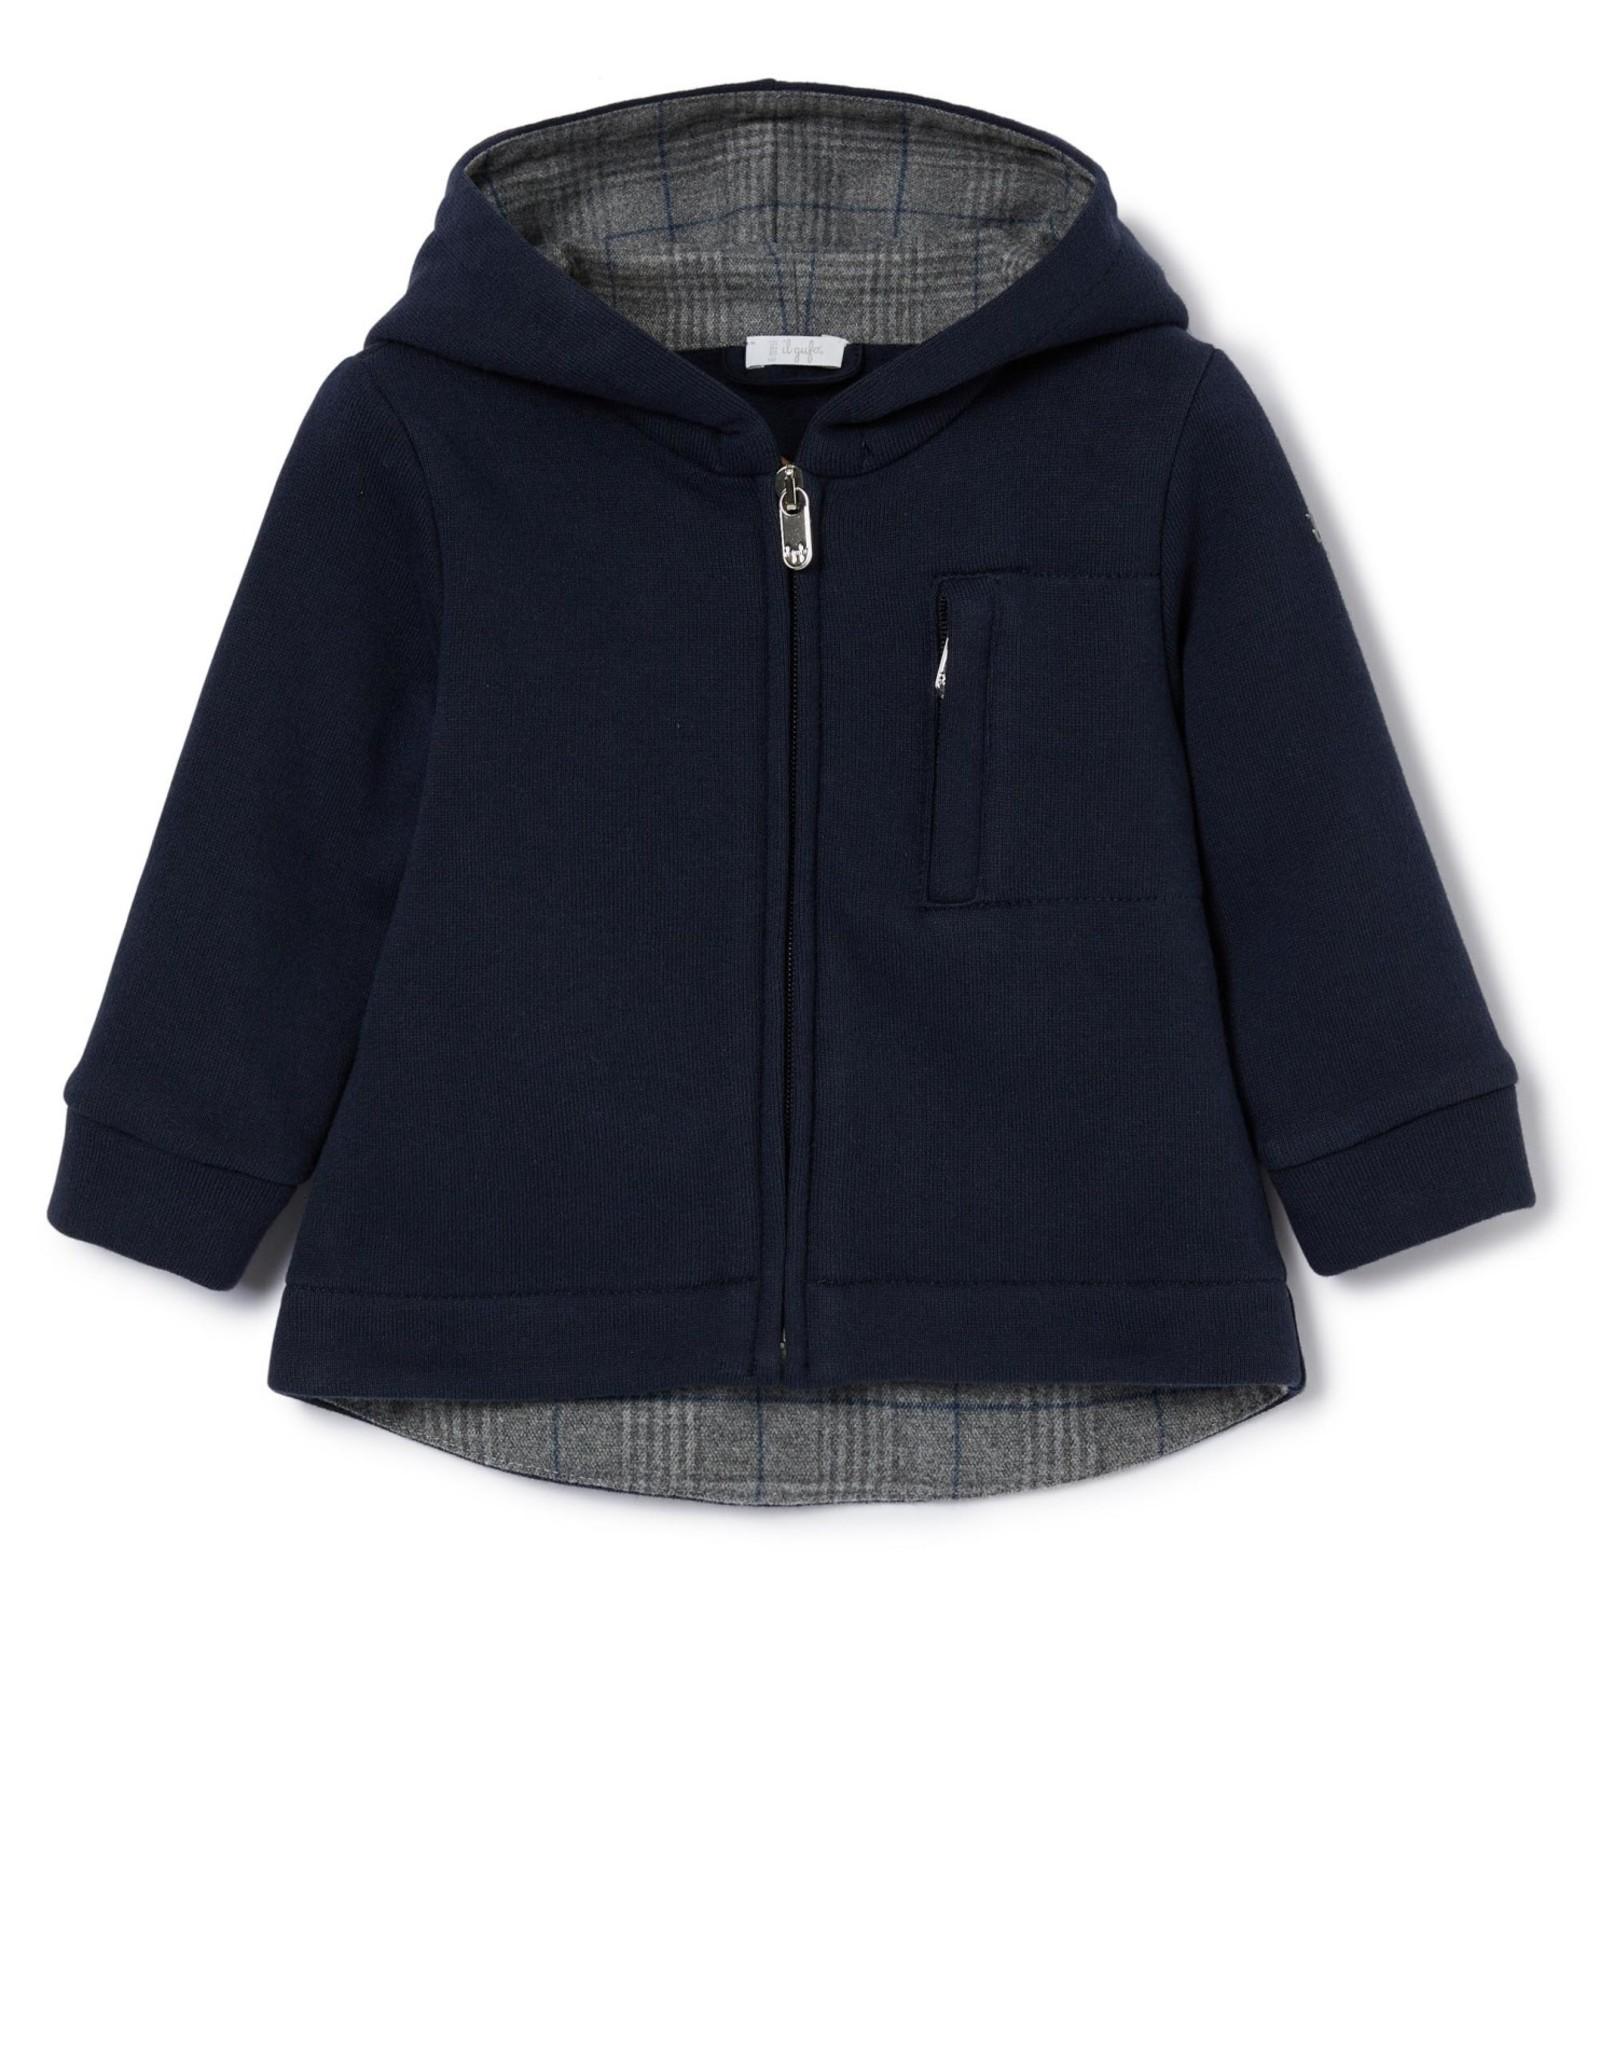 IL GUFO Jacket Navy Blue/Ash Grey